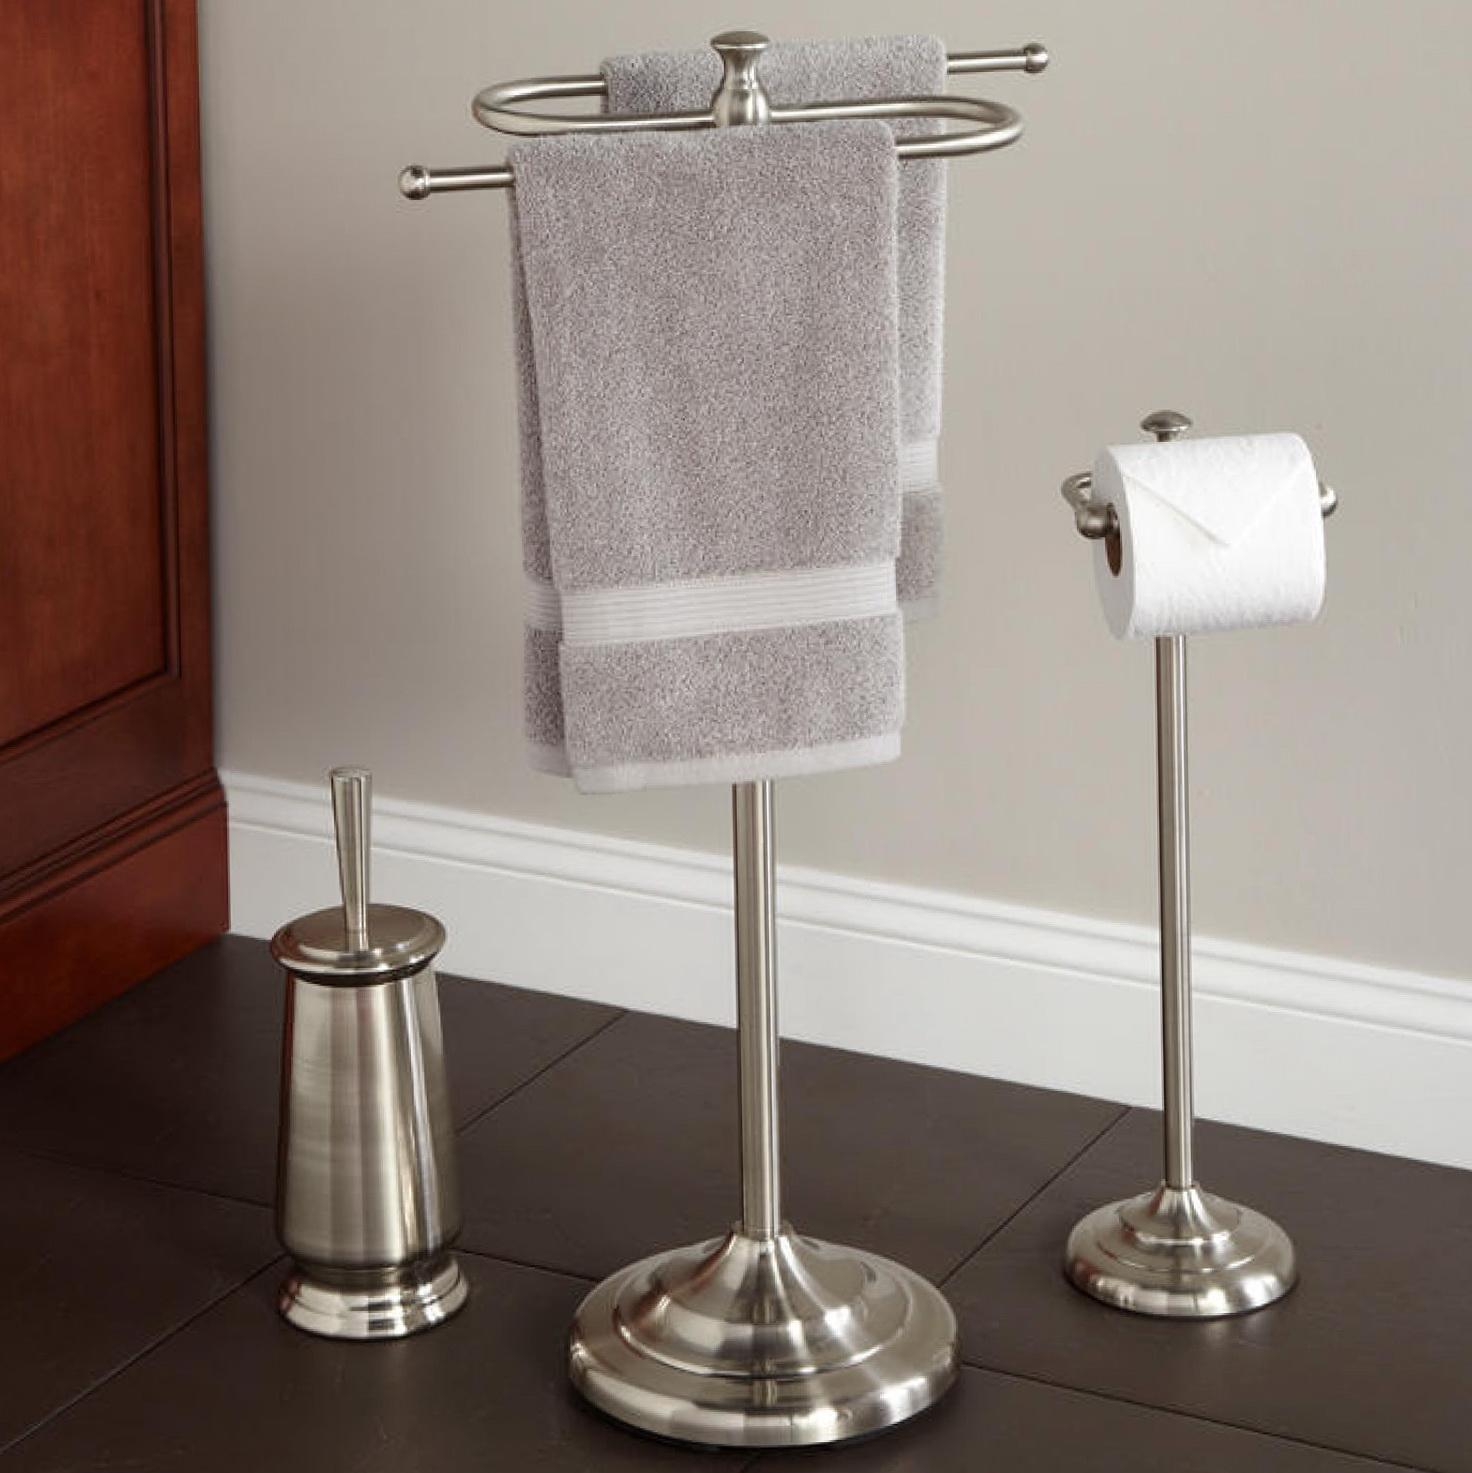 Bathroom Towel Bars And Toilet Paper Holders